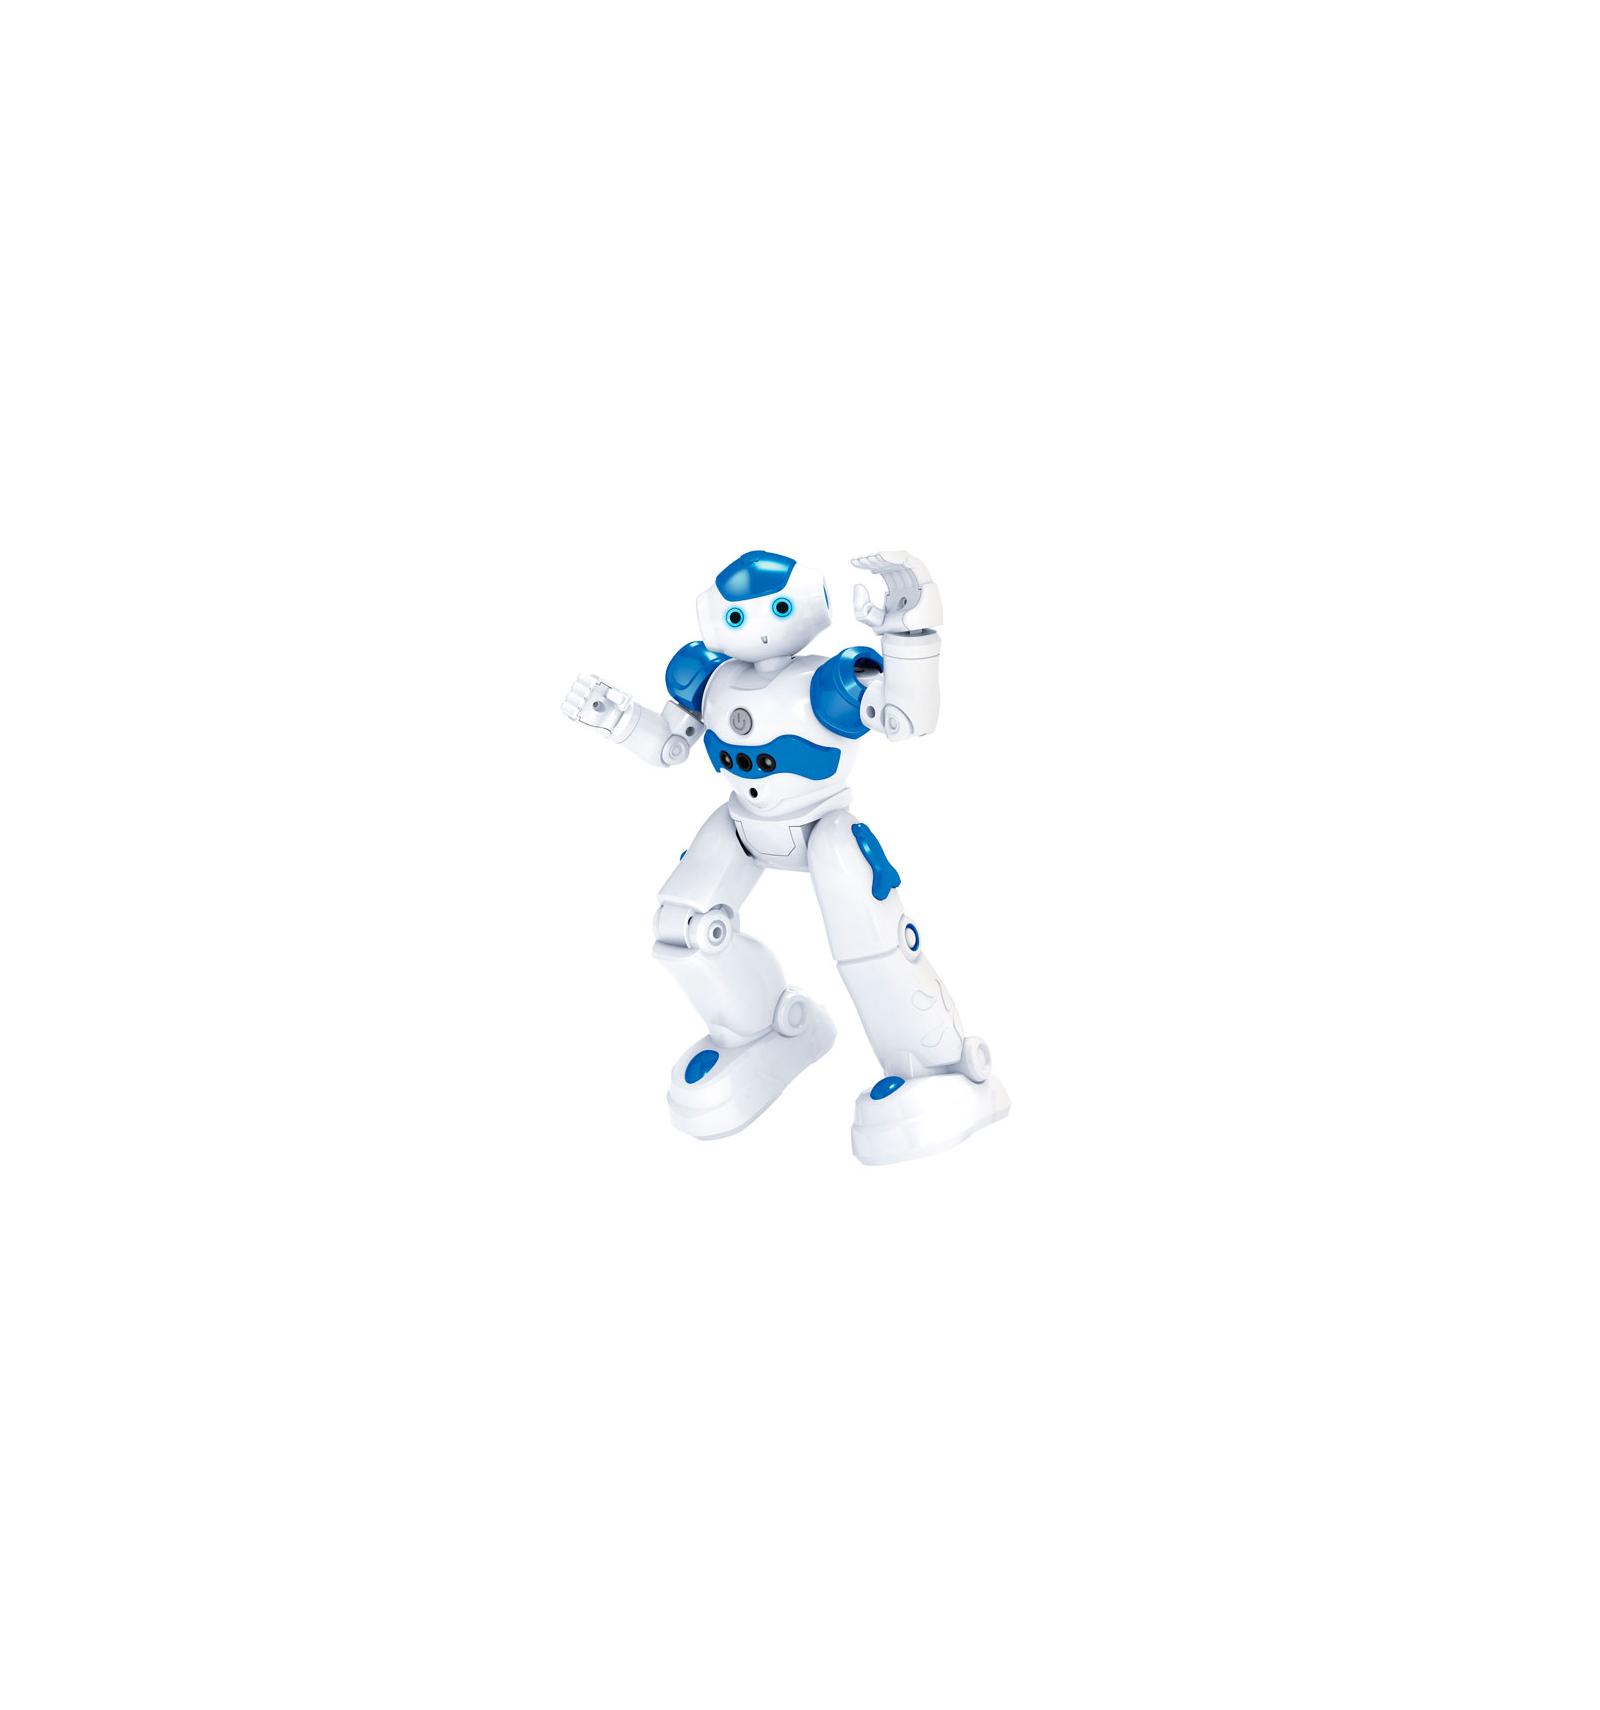 Acest metatrader forex robot În